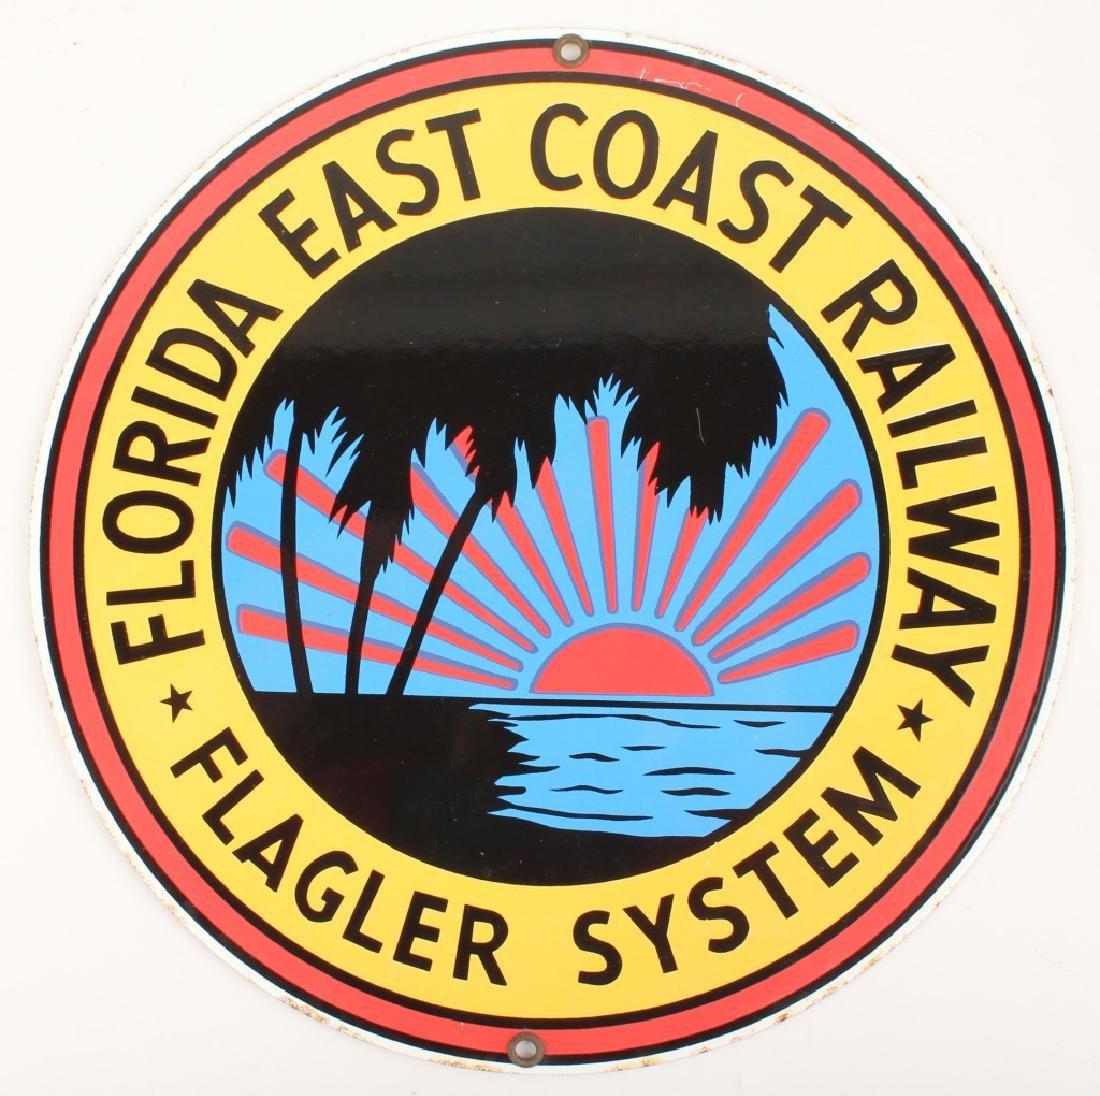 FLORIDA EAST COAST RAILWAY FLAGLER SYSTEM SIGN